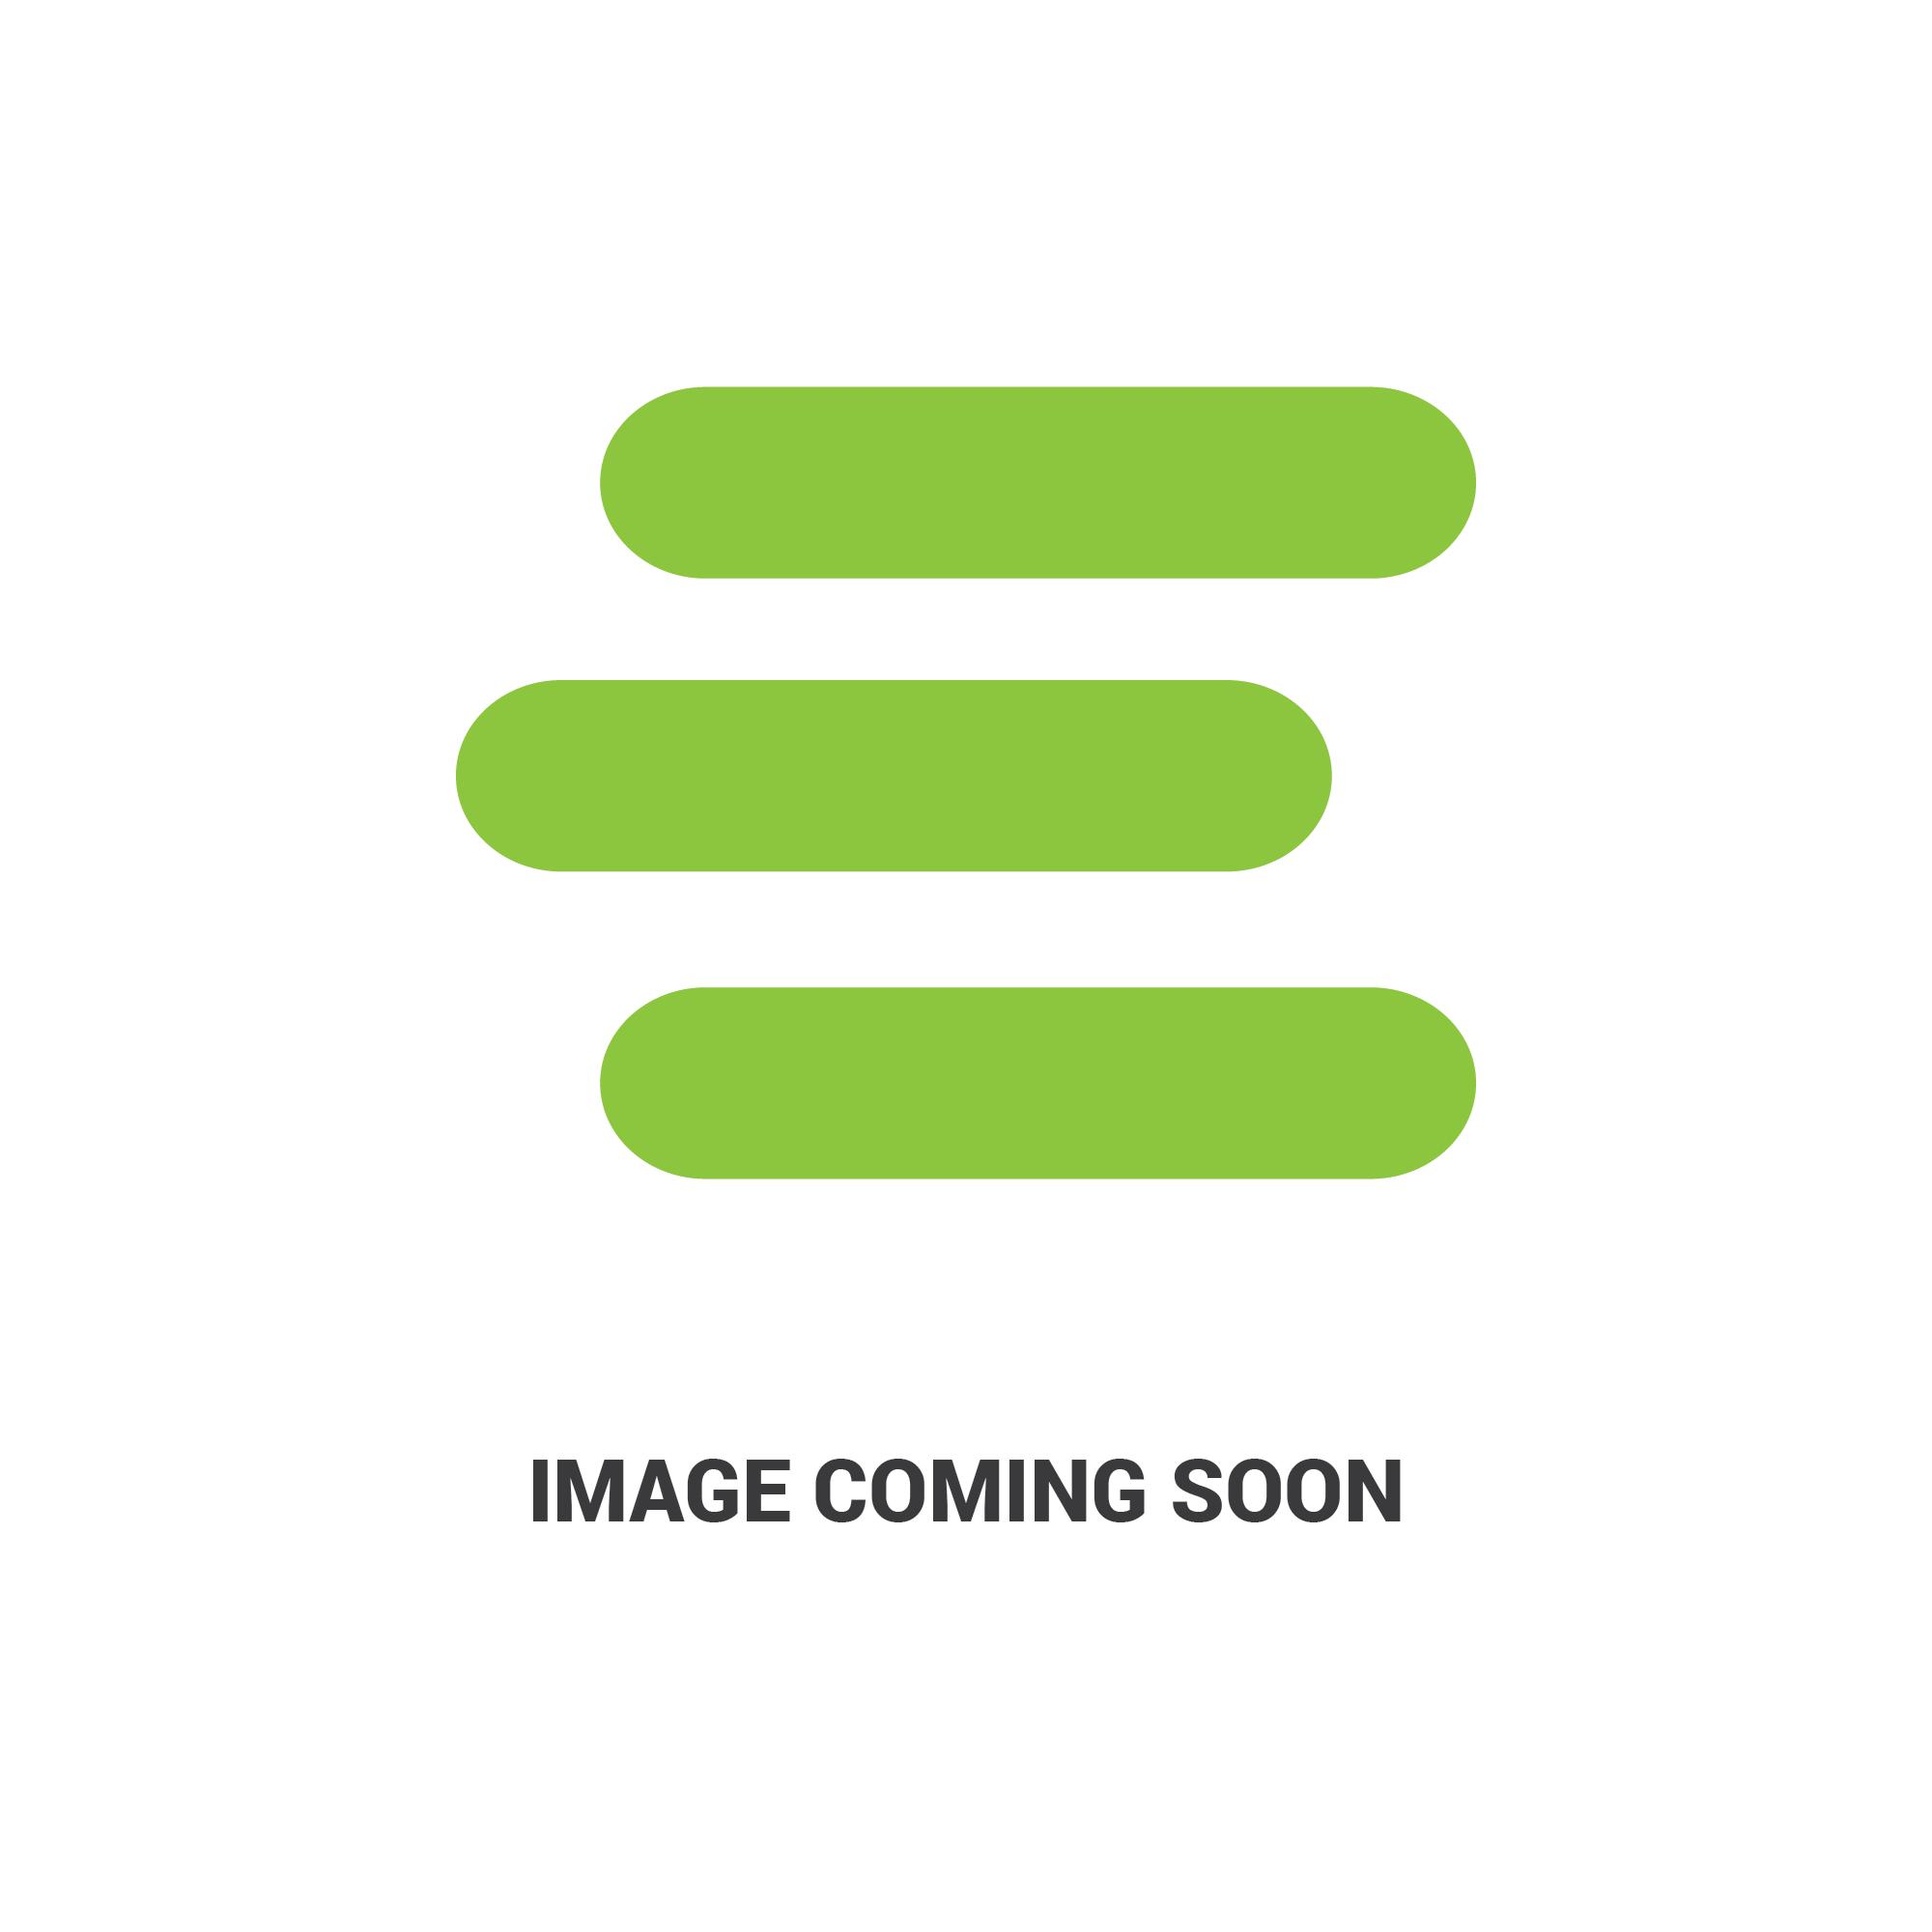 E-UR003edit 1161.jpg